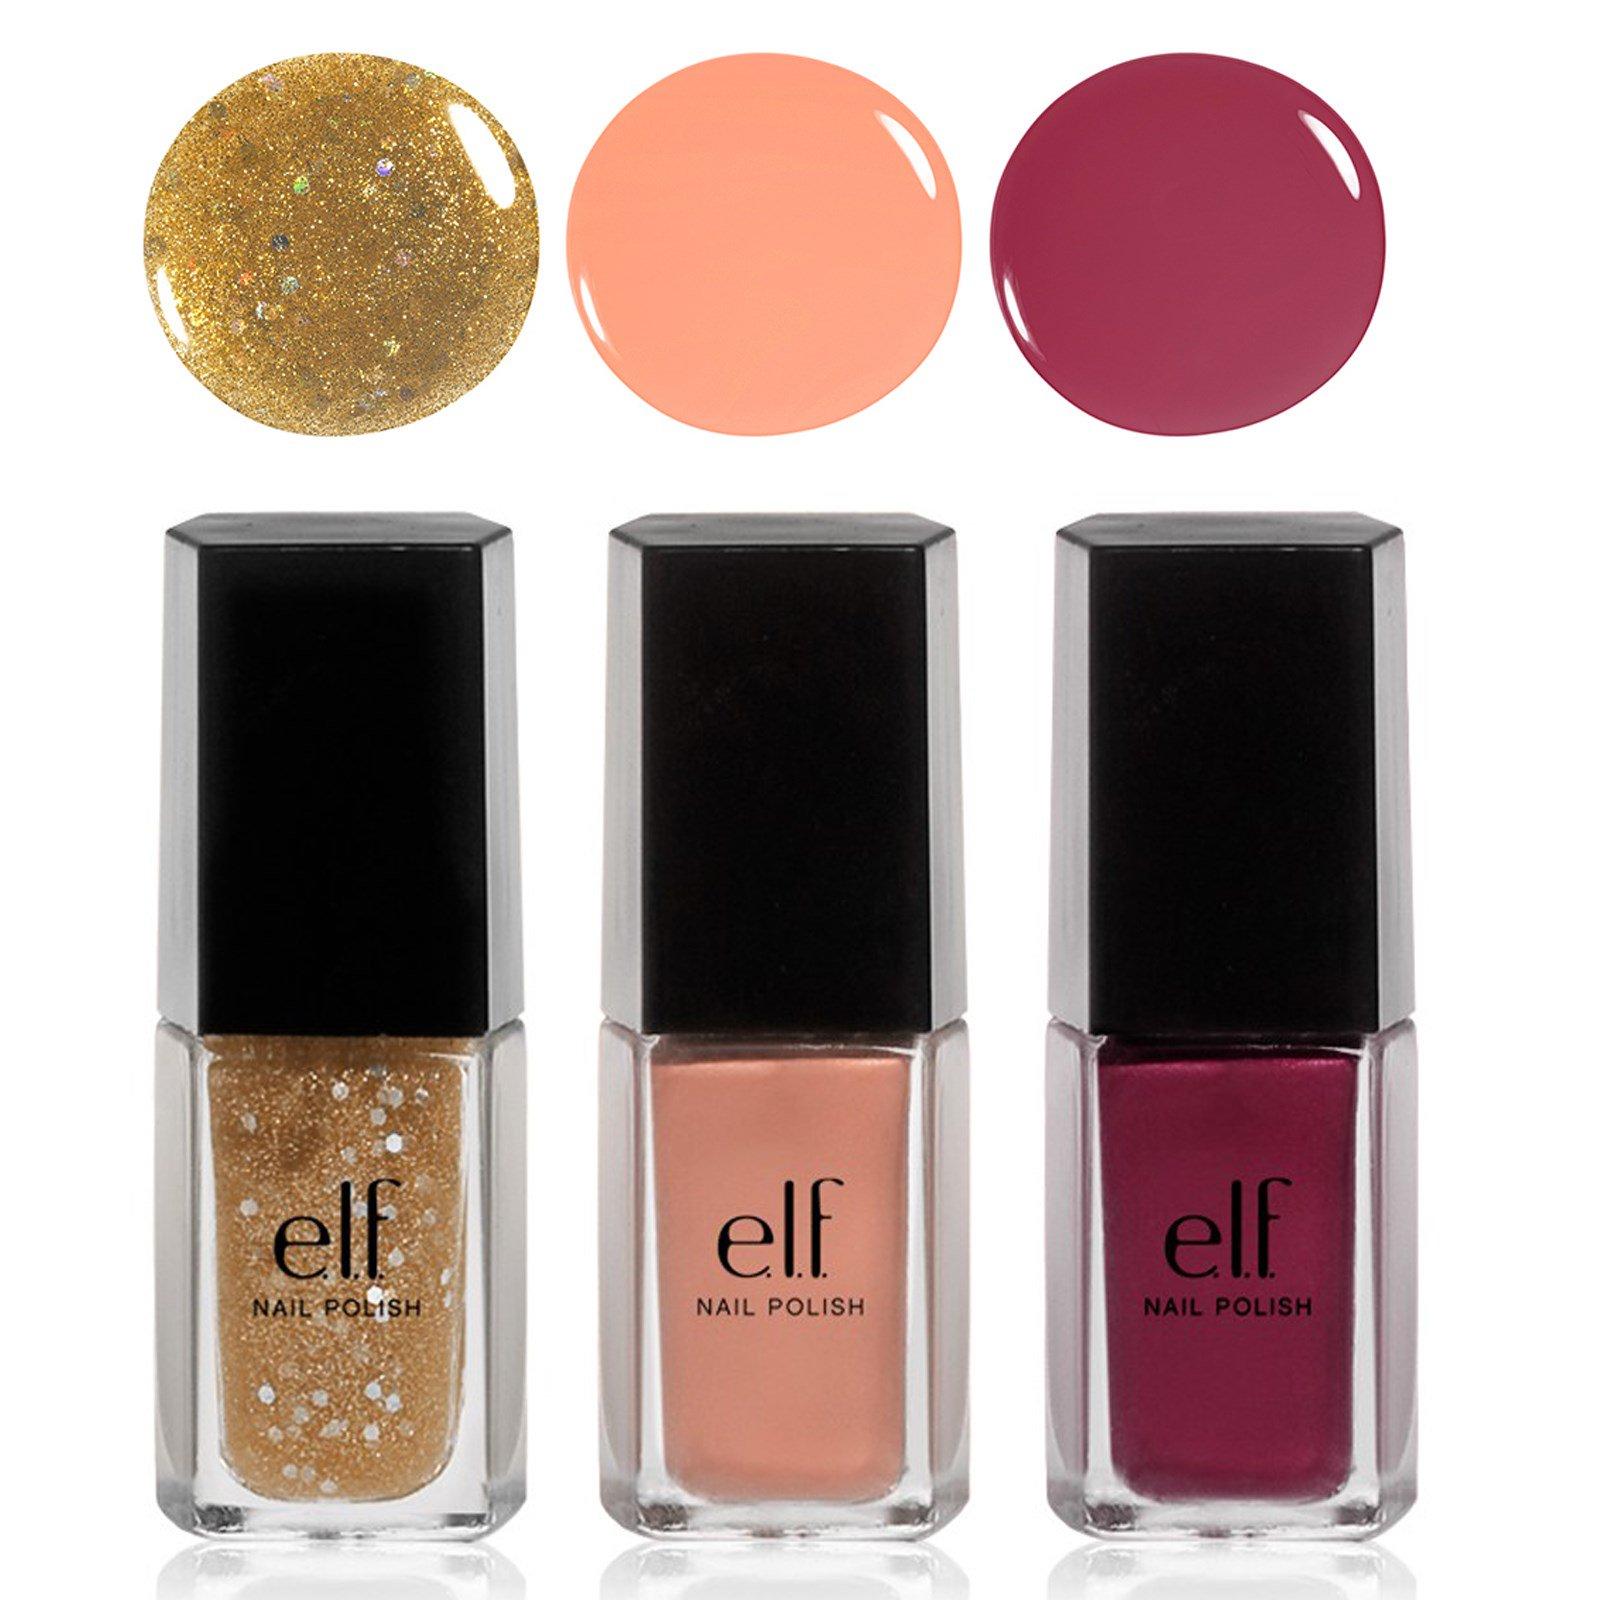 E.L.F. Cosmetics, Glam Bam Nail Polish Set, 0.203 fl oz (6 ml) Each ...